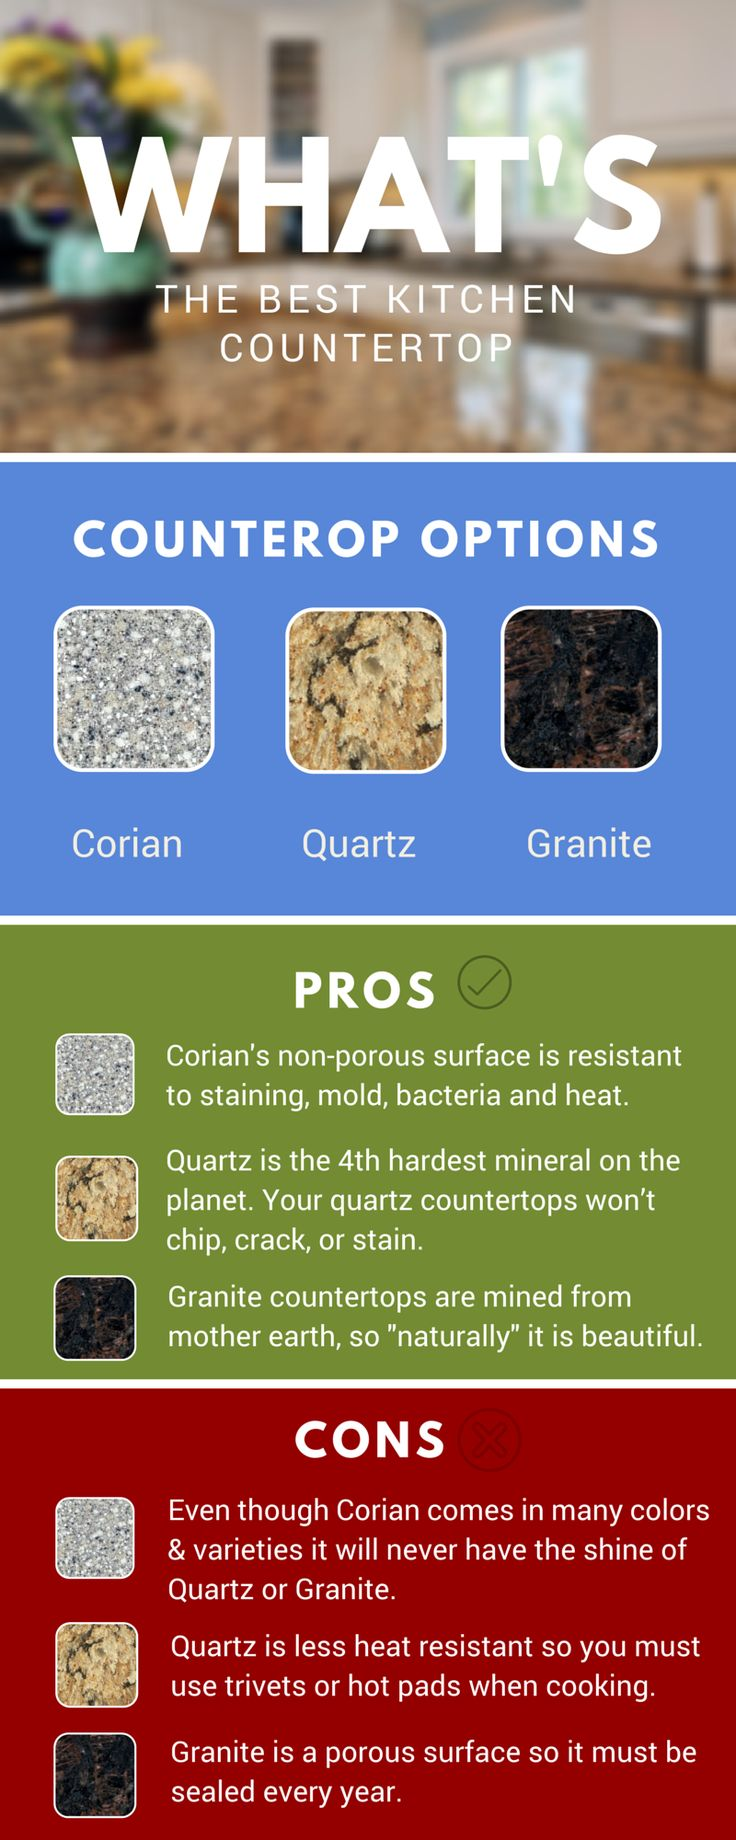 corian countertops corian kitchen countertops What s the Best Kitchen Countertop Corian Quartz or Granite